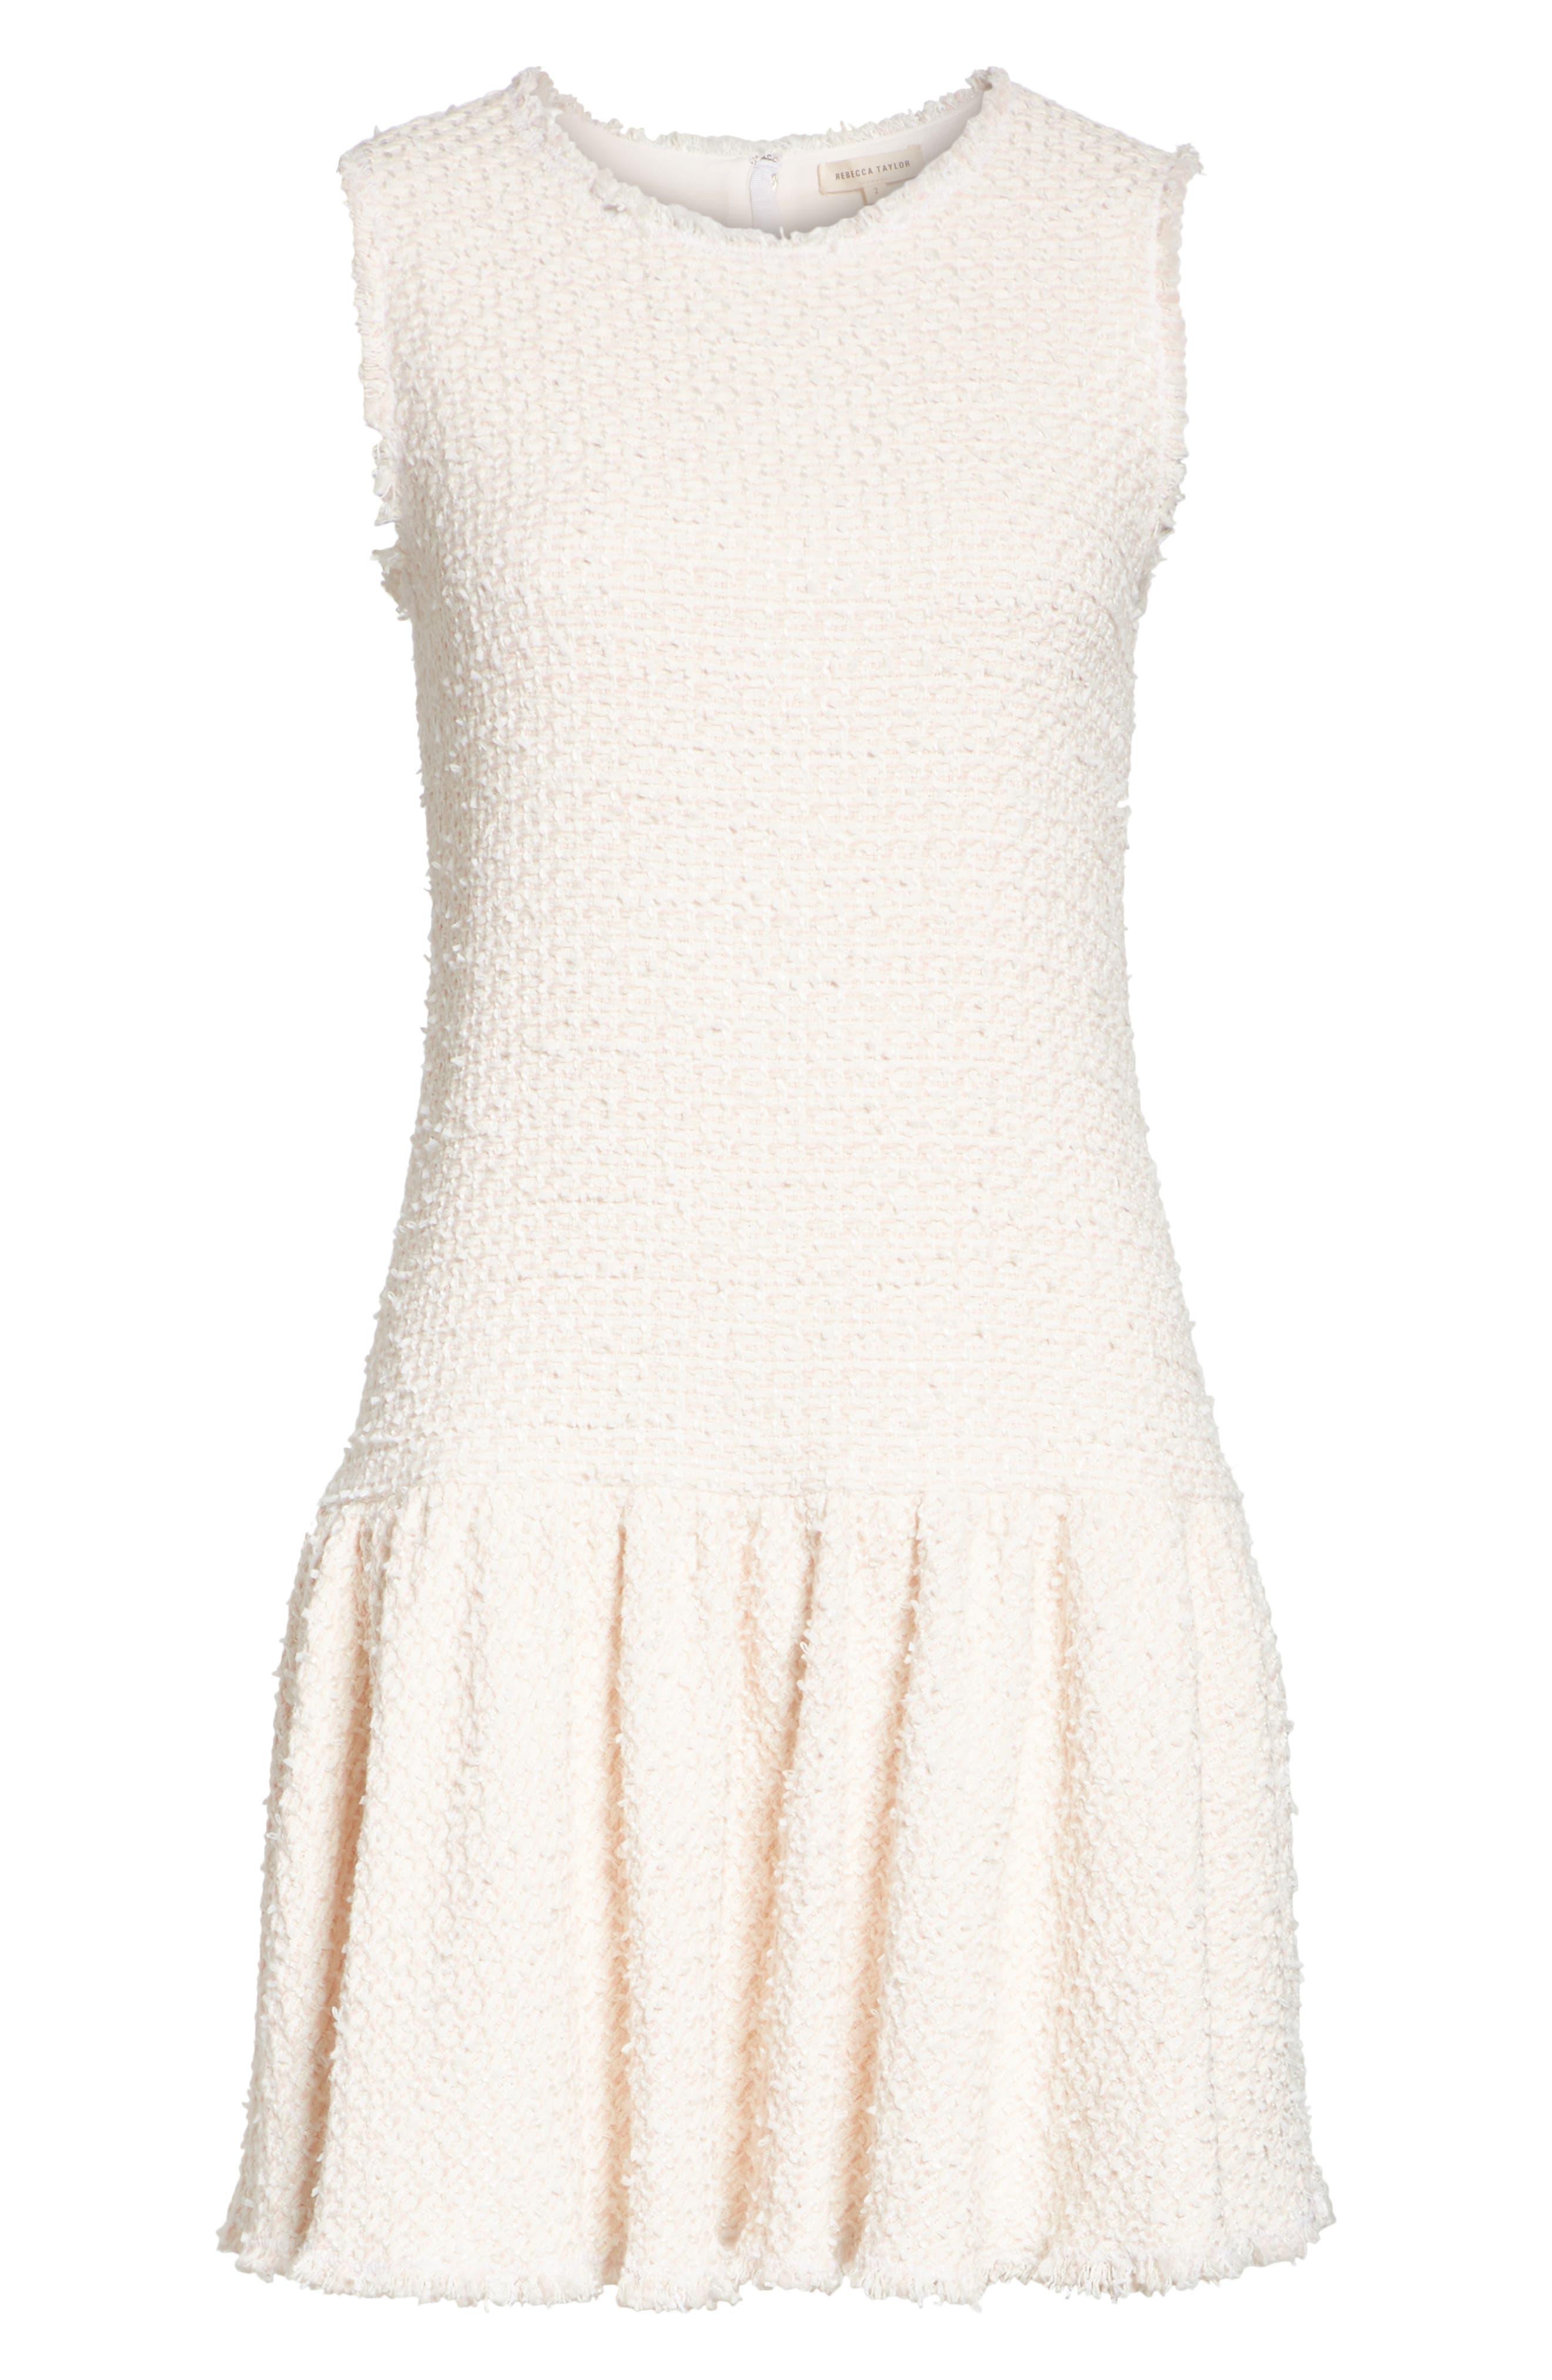 Drop Waist Tweed Dress,                             Alternate thumbnail 6, color,                             697